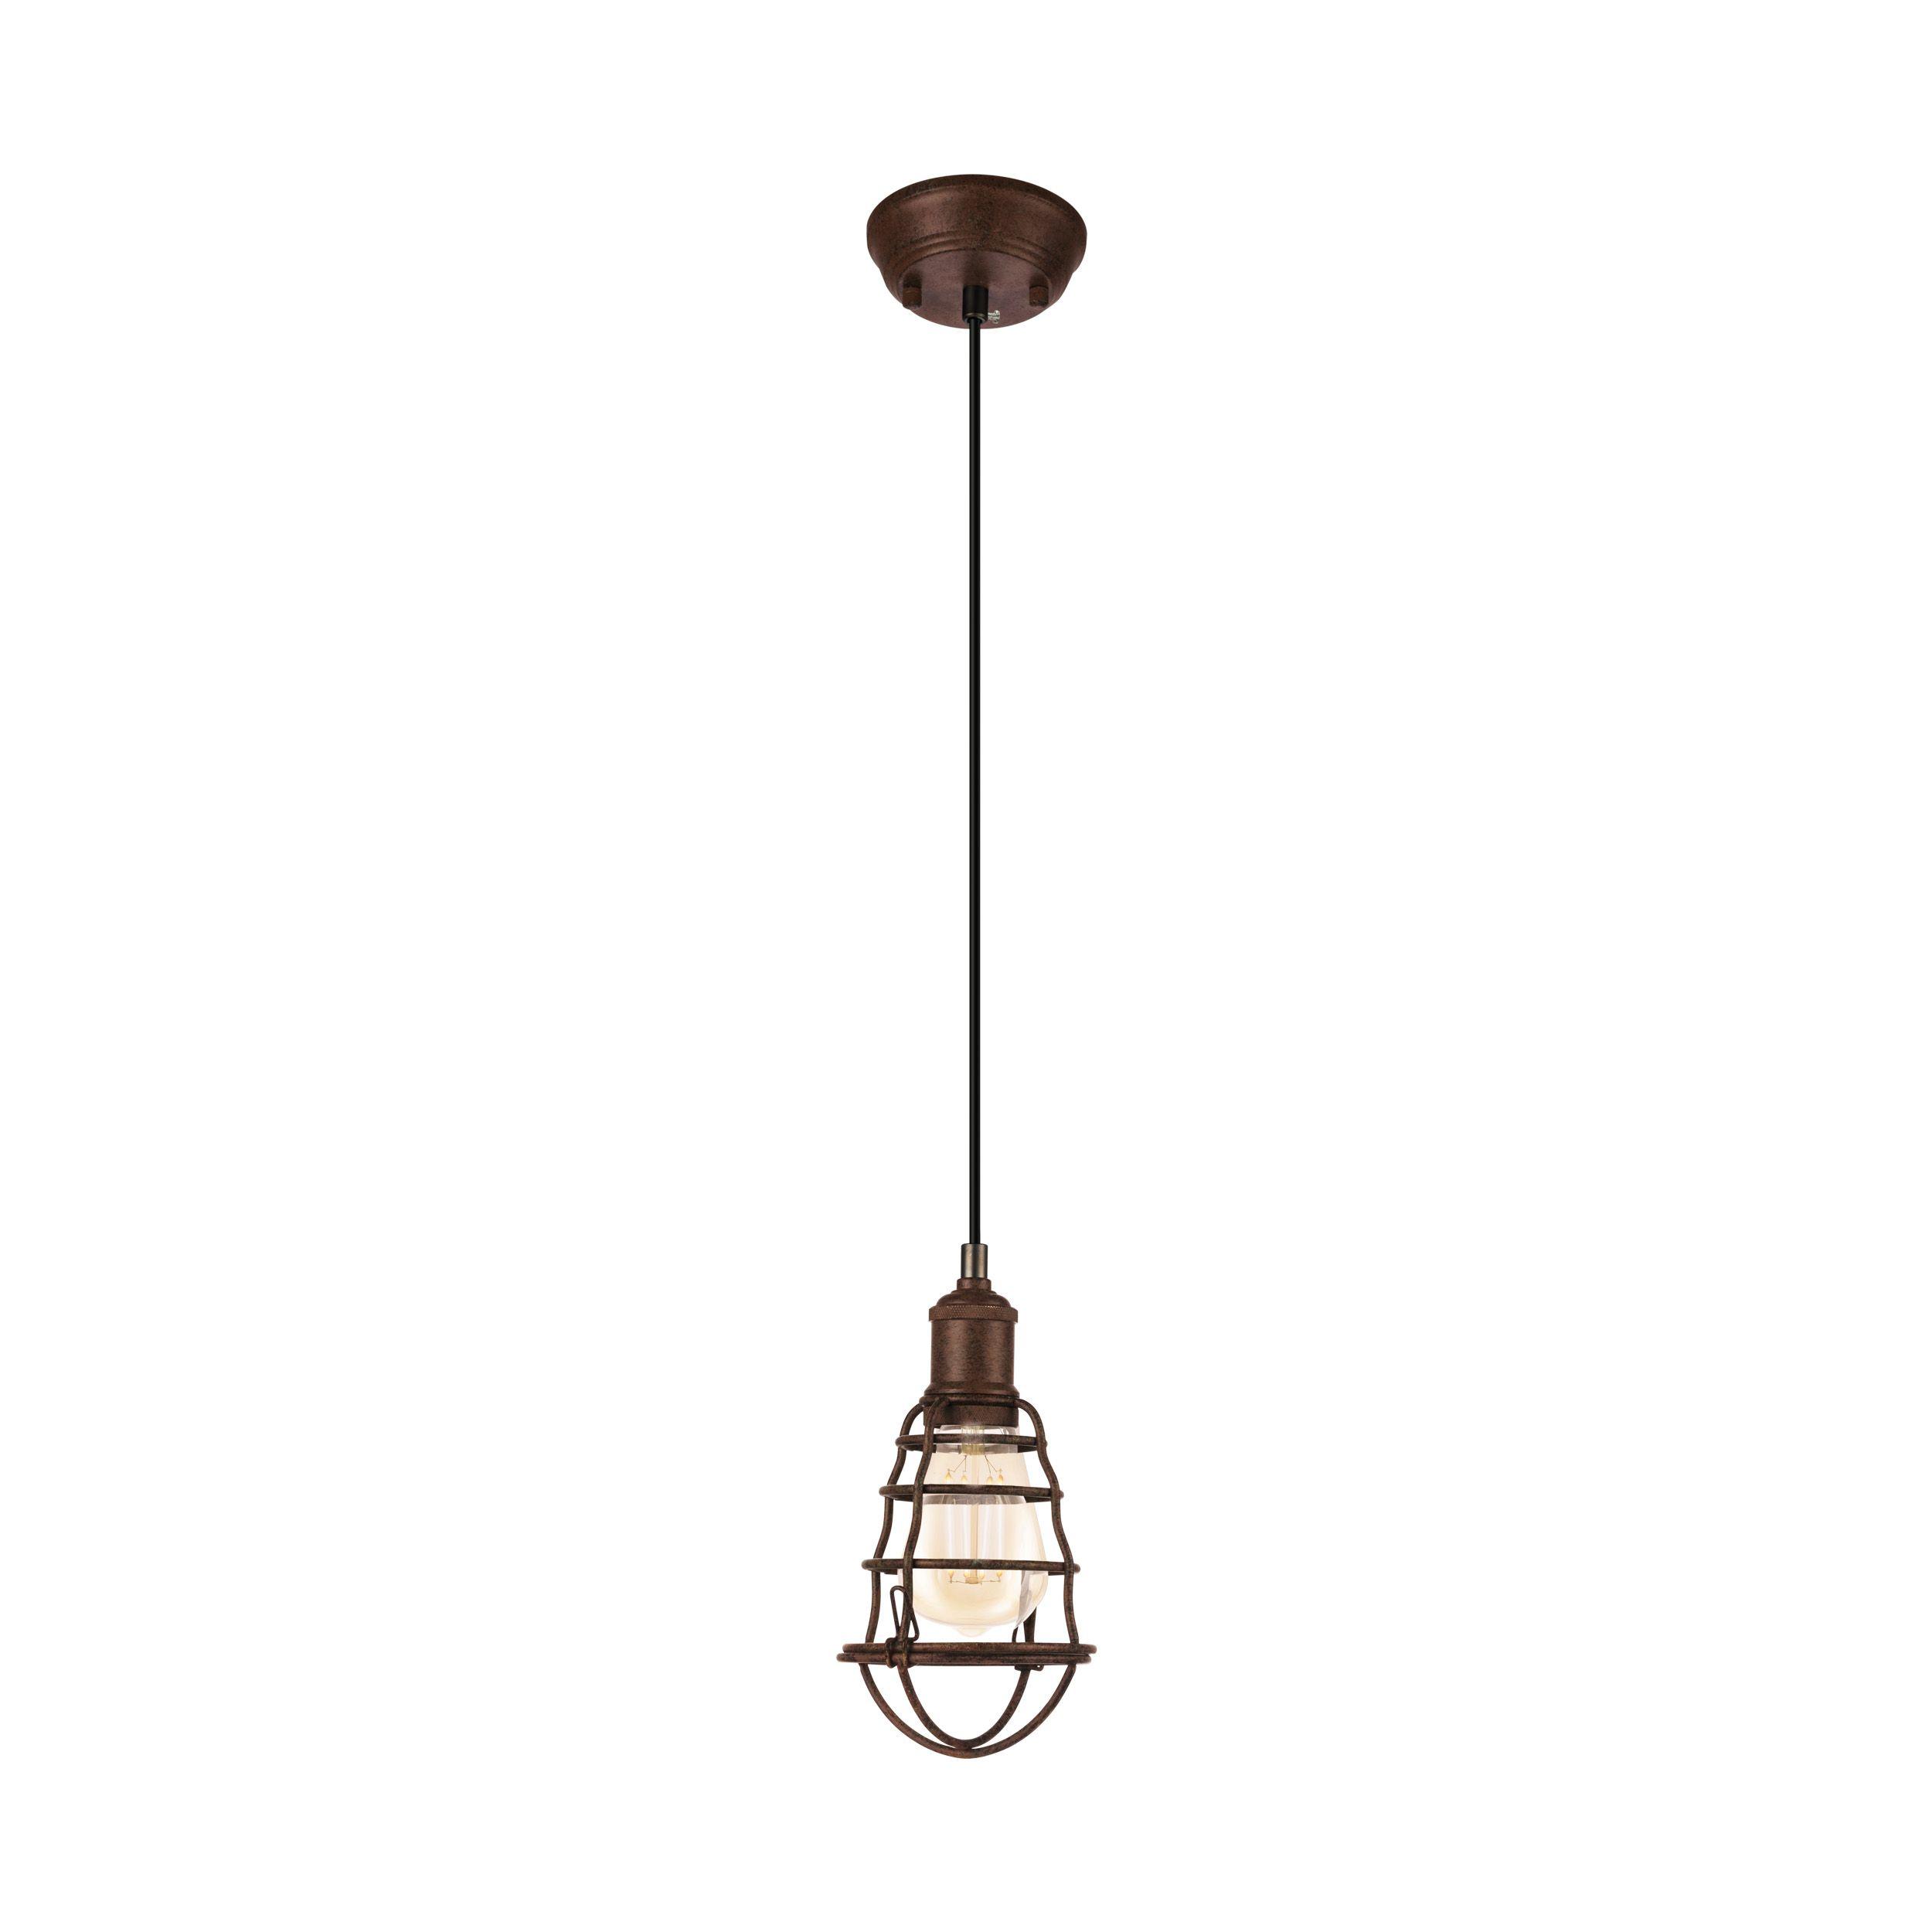 Port seton hanglamp